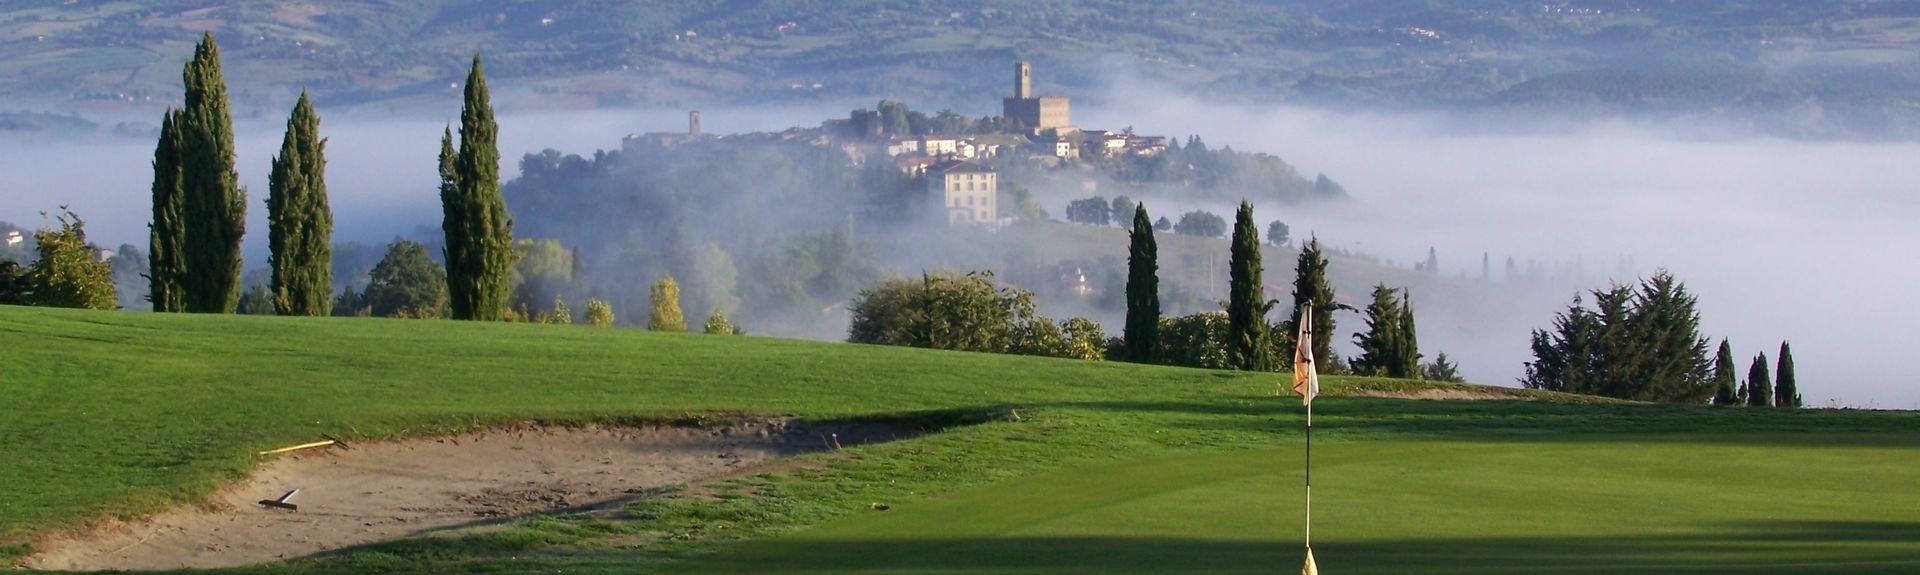 Pelago, Metropolitan City of Florence, Tuscany, Italy